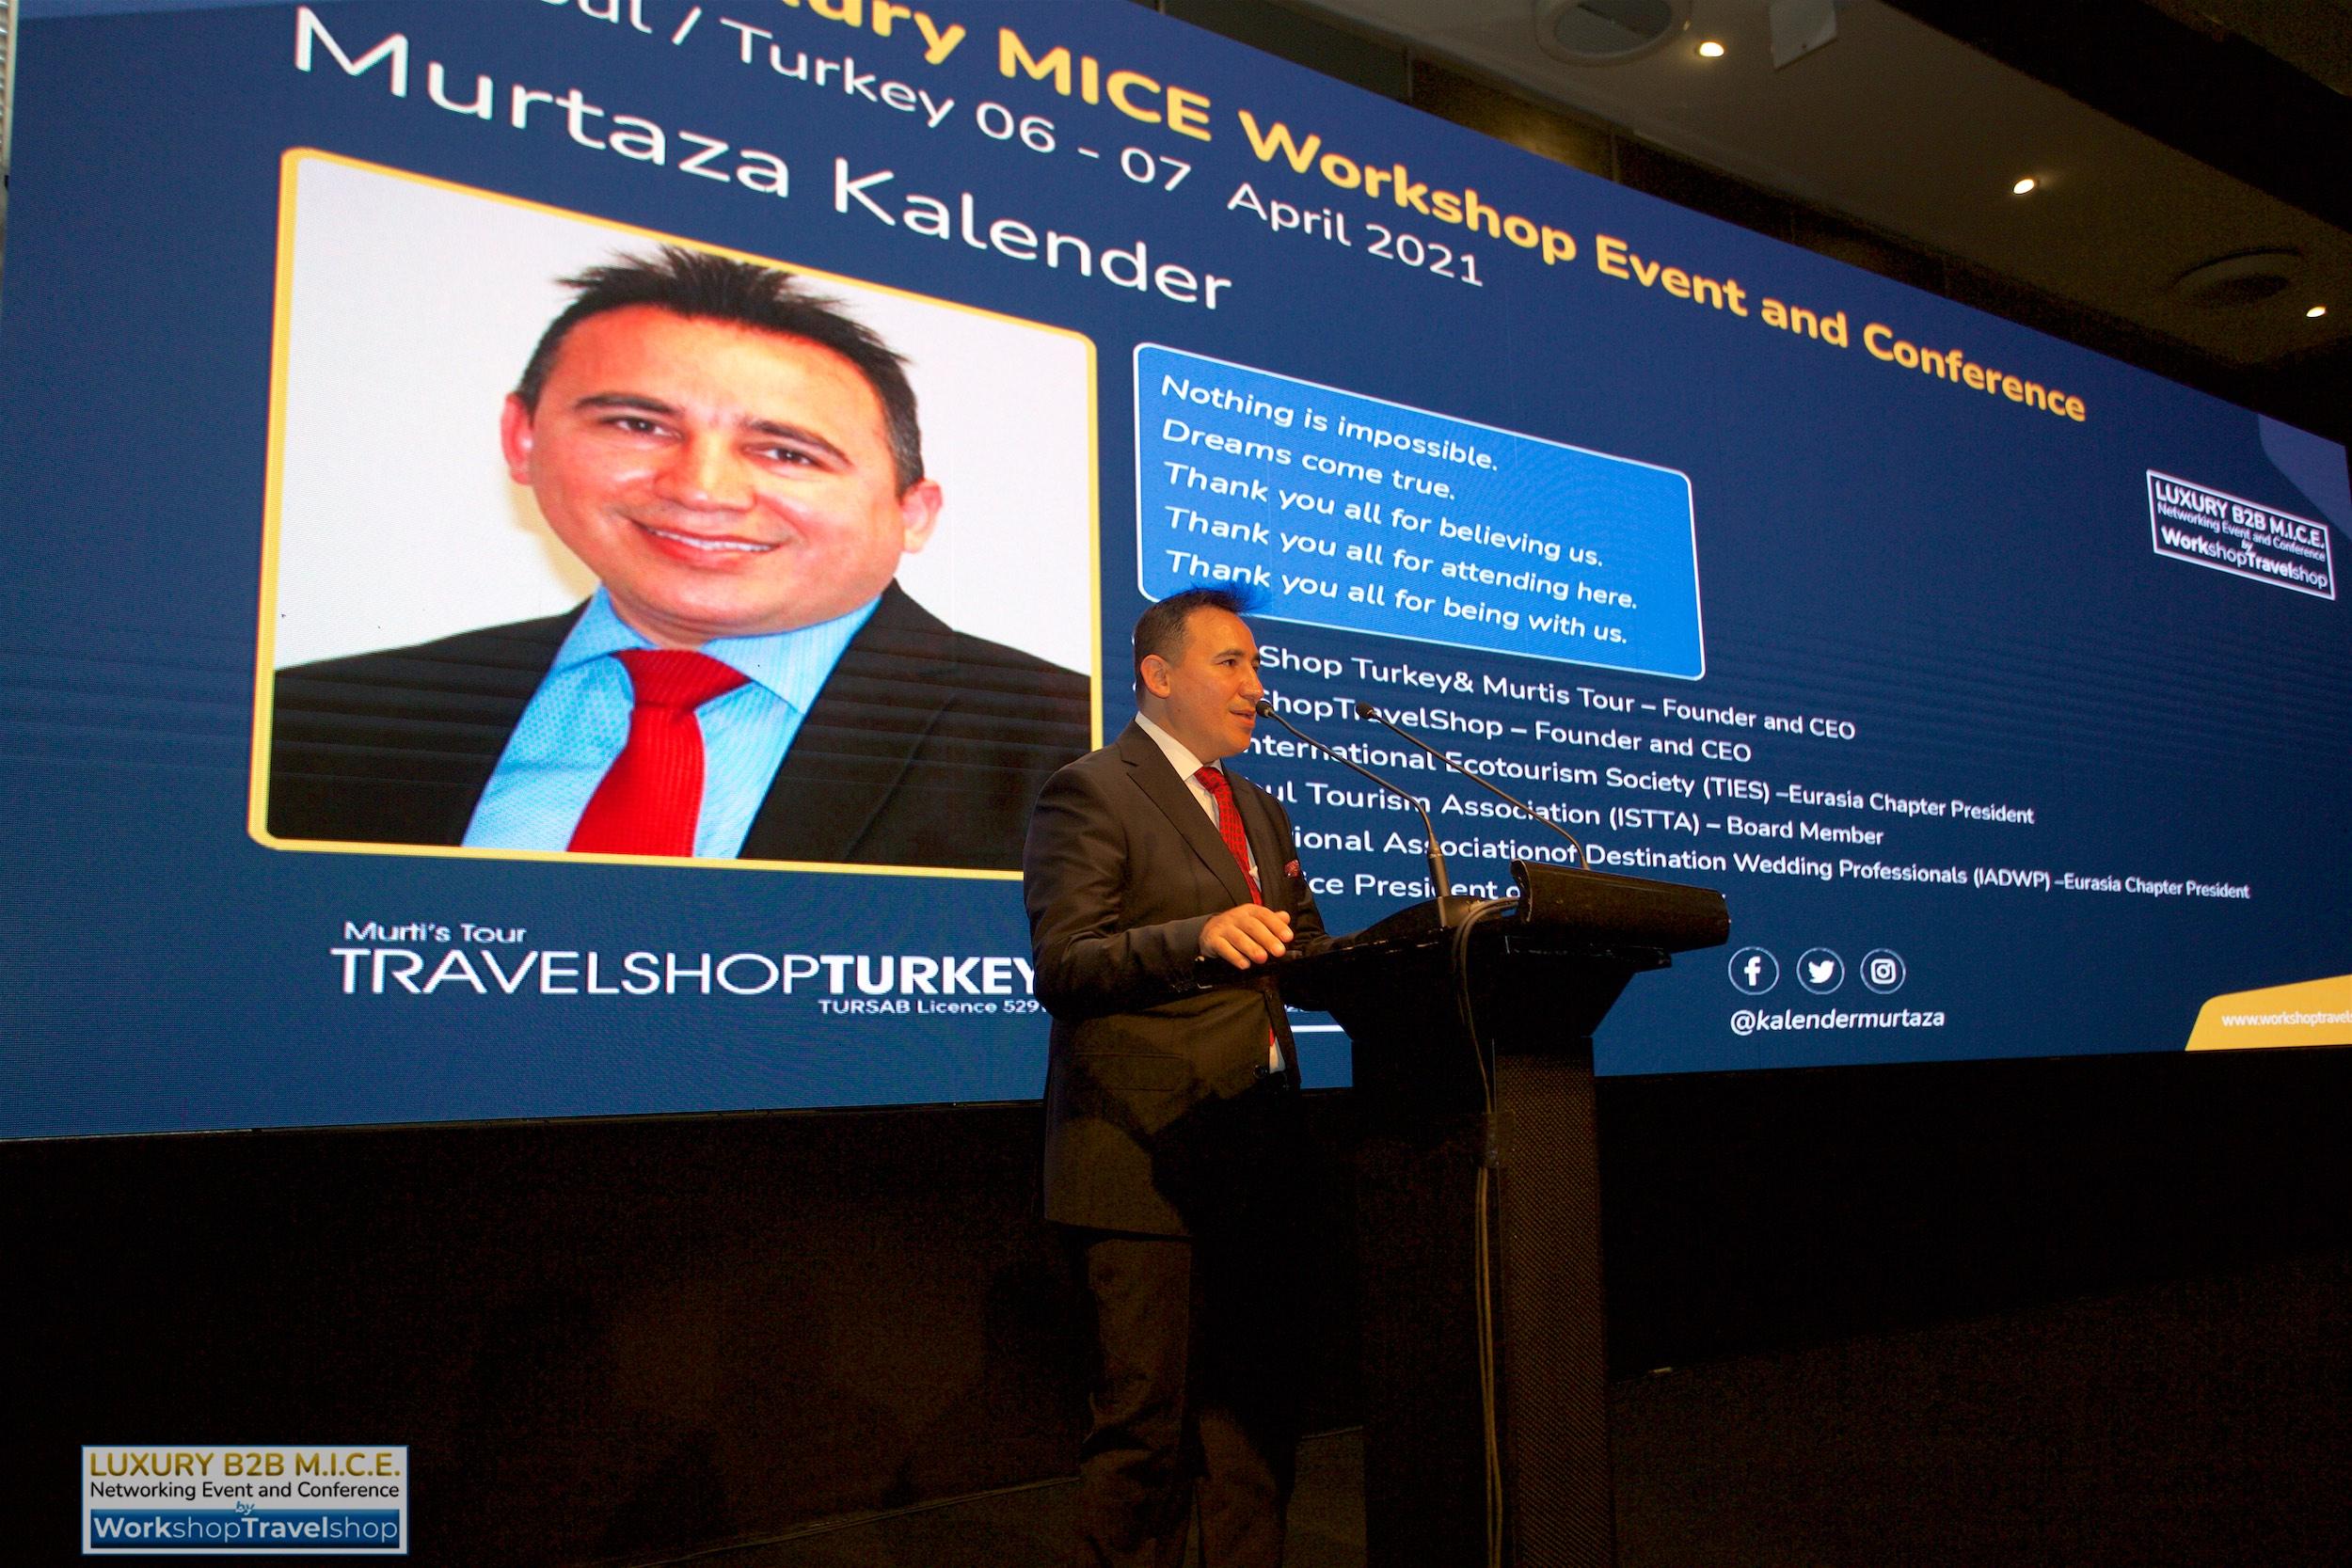 B2B Luxury MICE & Conference turizm sektörüne moral verdi..